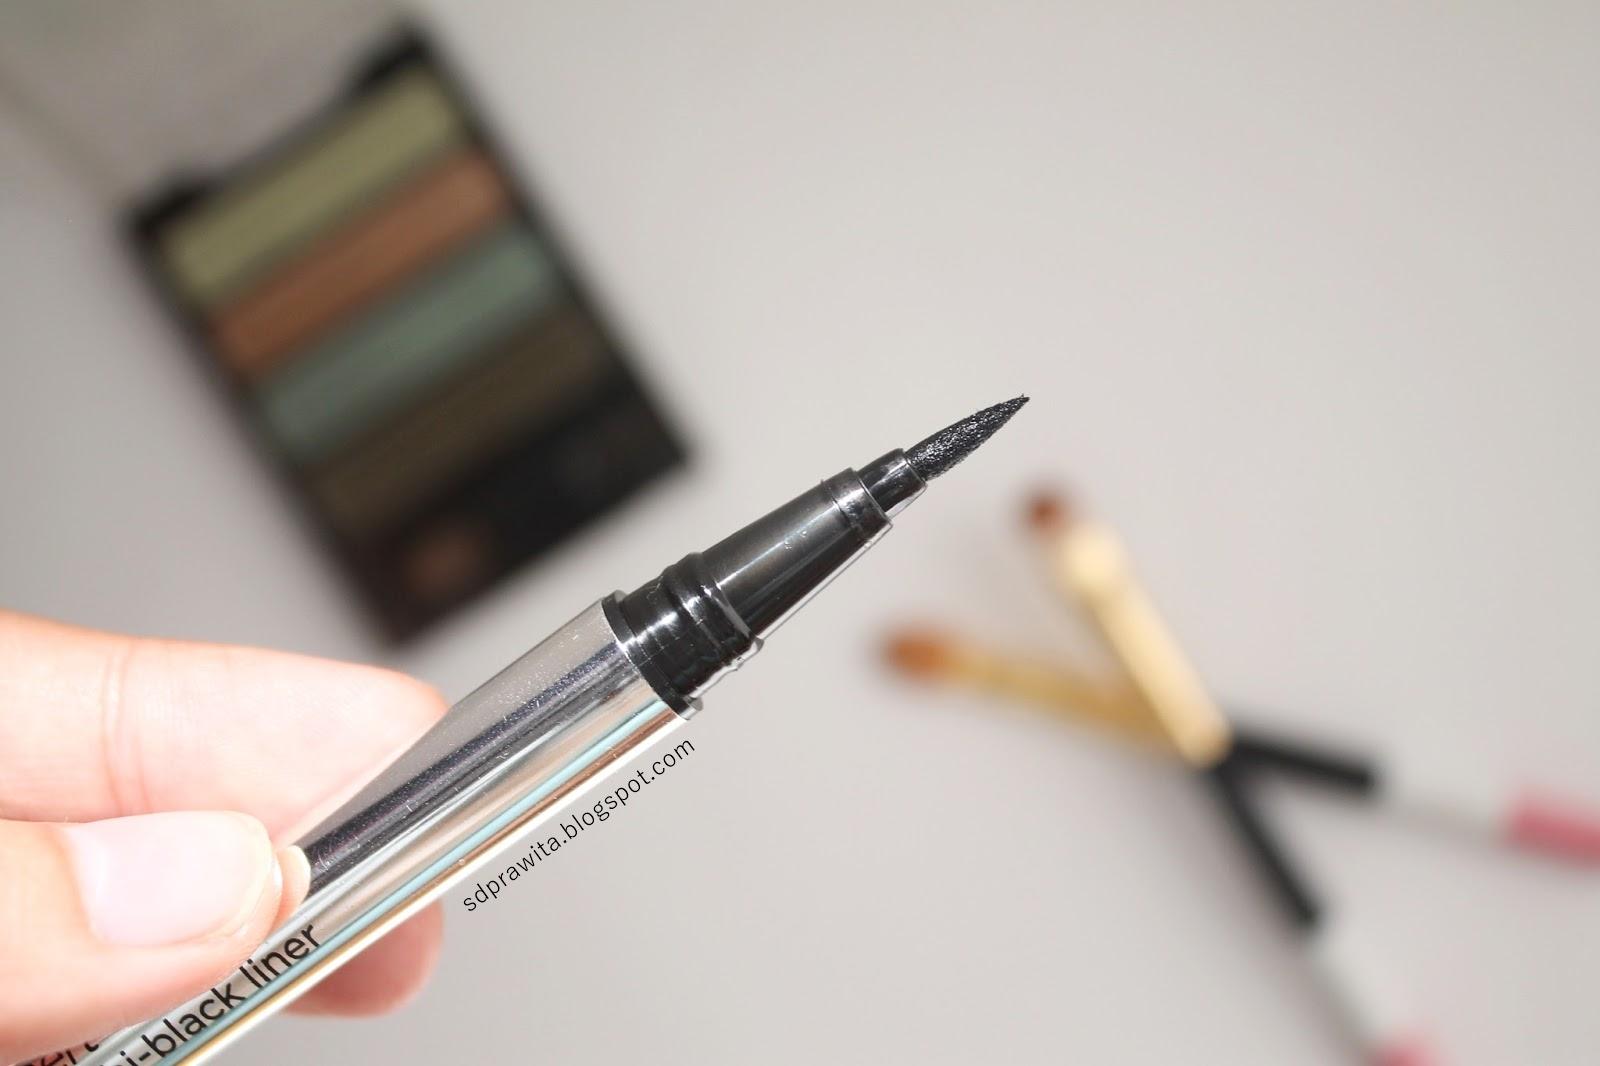 Review Wardah Eyexpert Optimum Hi Black Liner Firadwip Eyeliner Packagingnya Yang Berwarna Silver Terlihat Mewah Eksklusif Dan Mahal Padahal Harganya Affordable Cuma 65 Ribu Aja